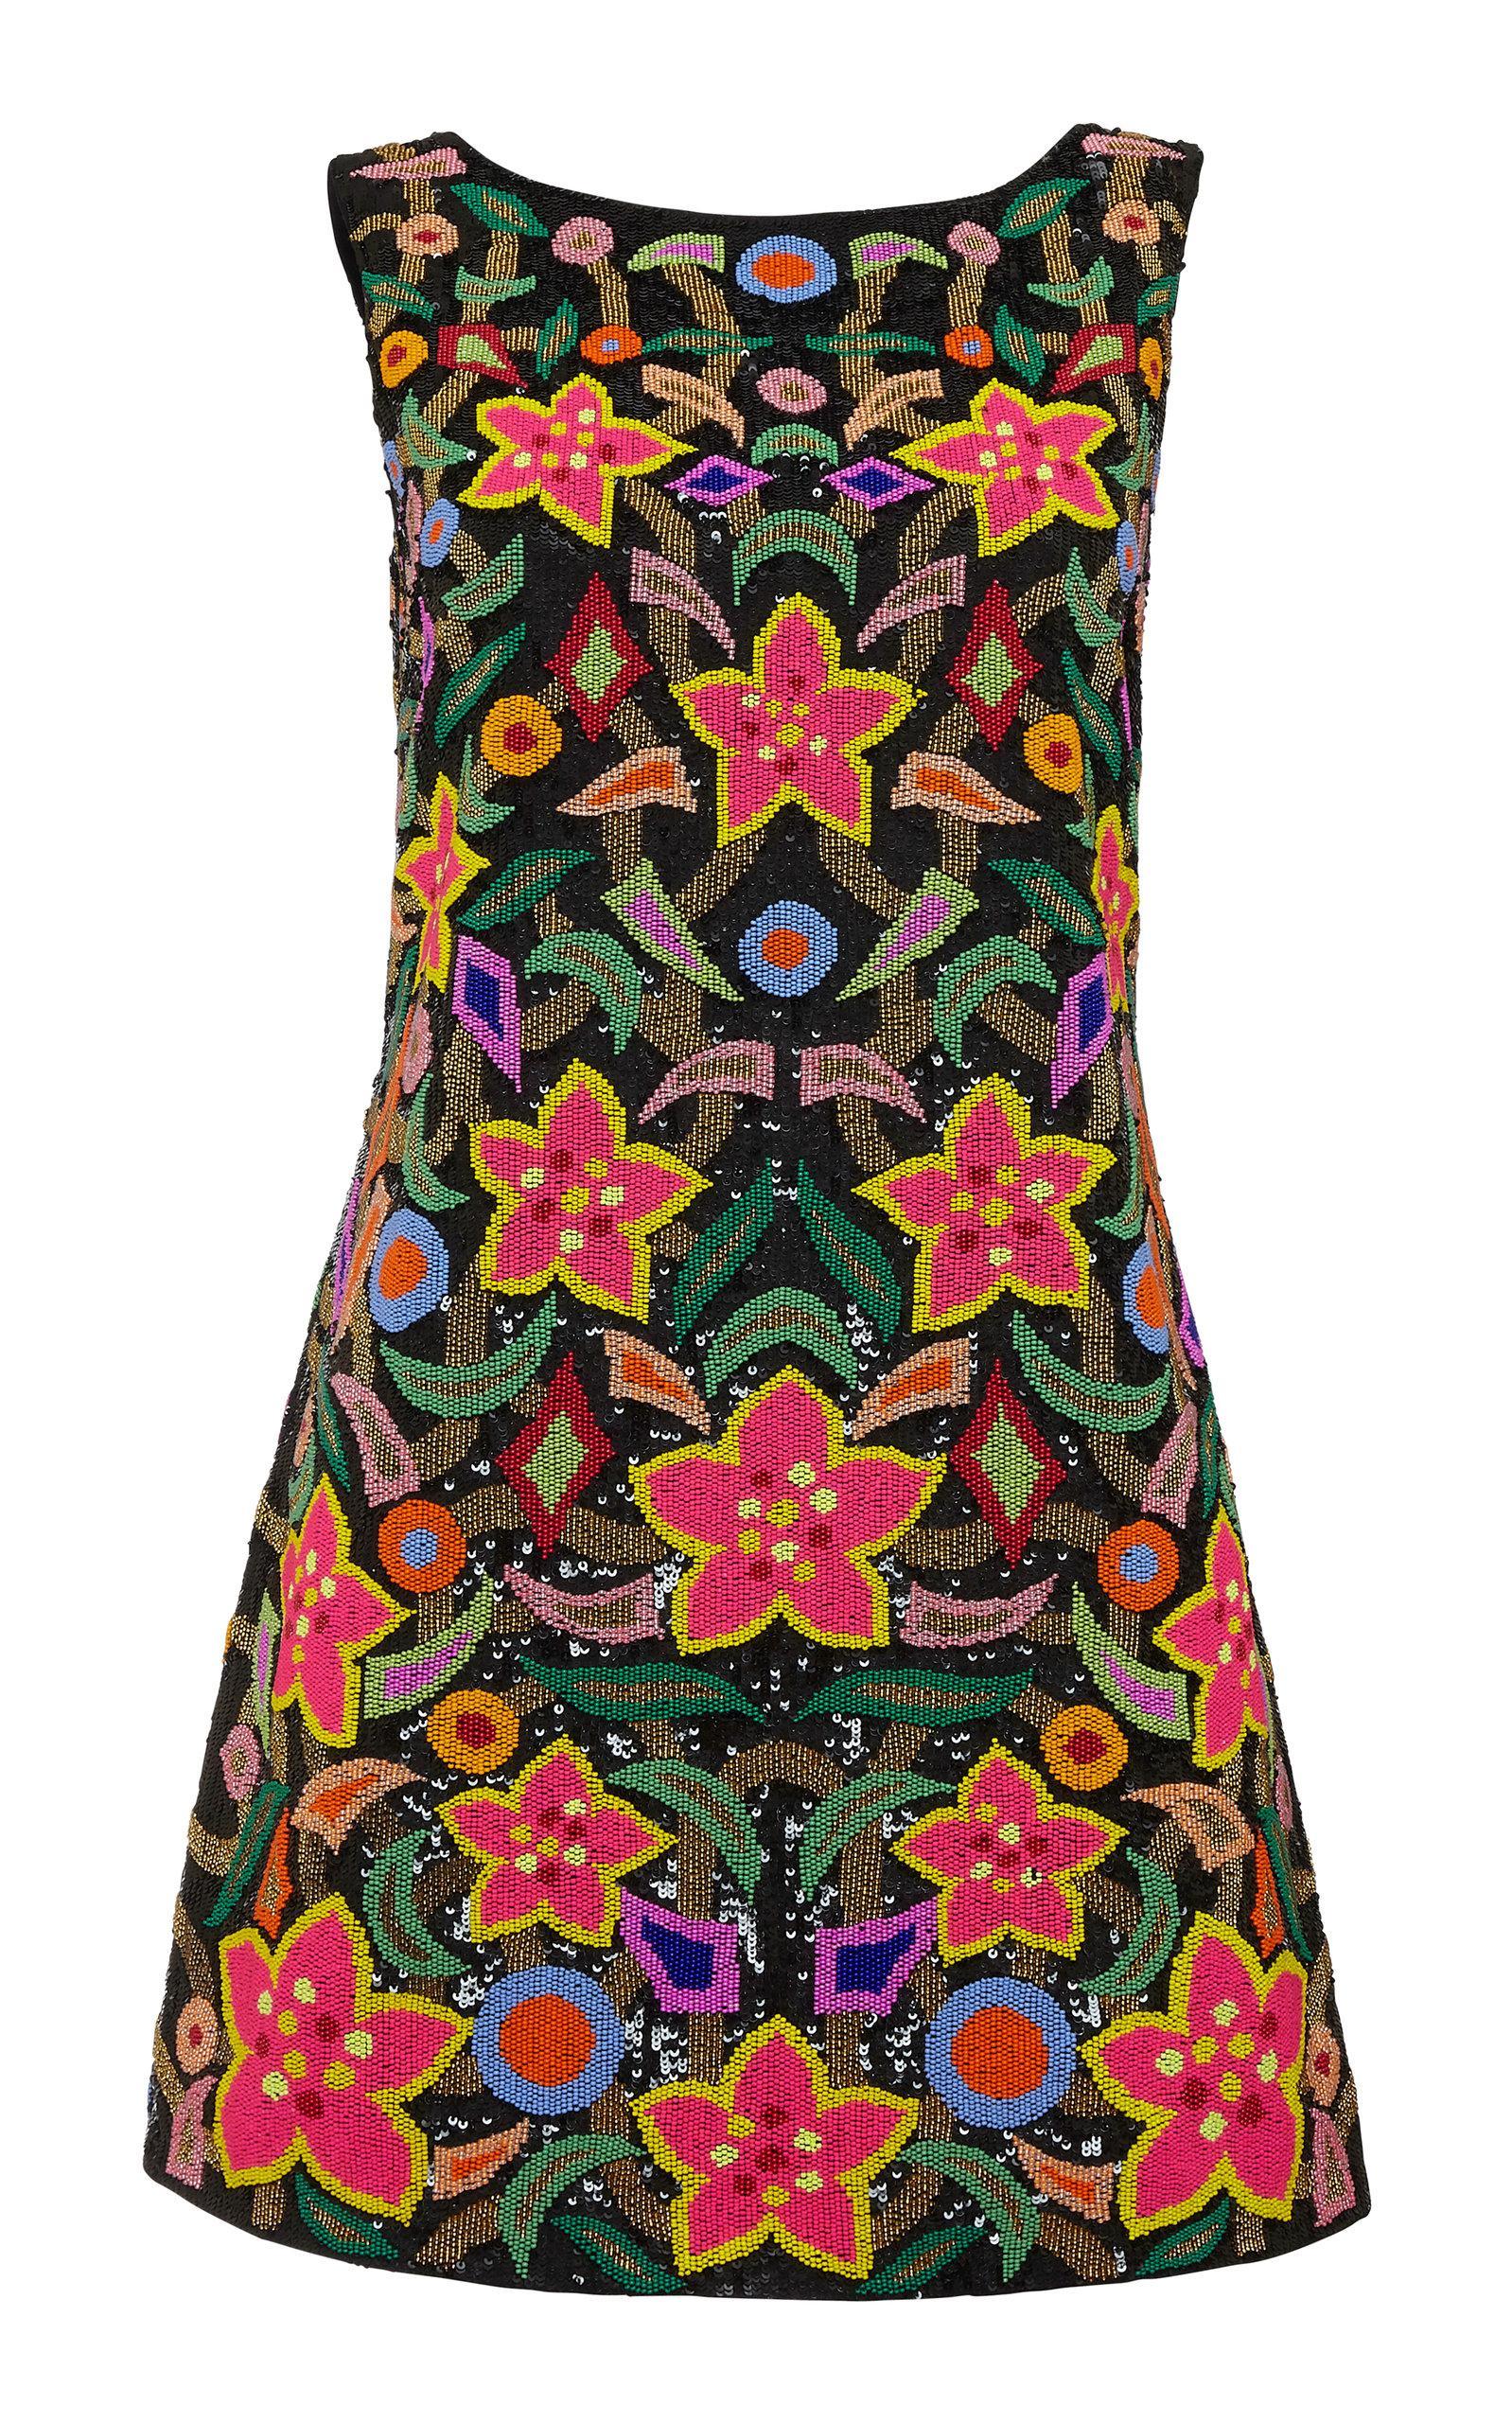 Khosla Jani Beaded Mini Dress In Multi